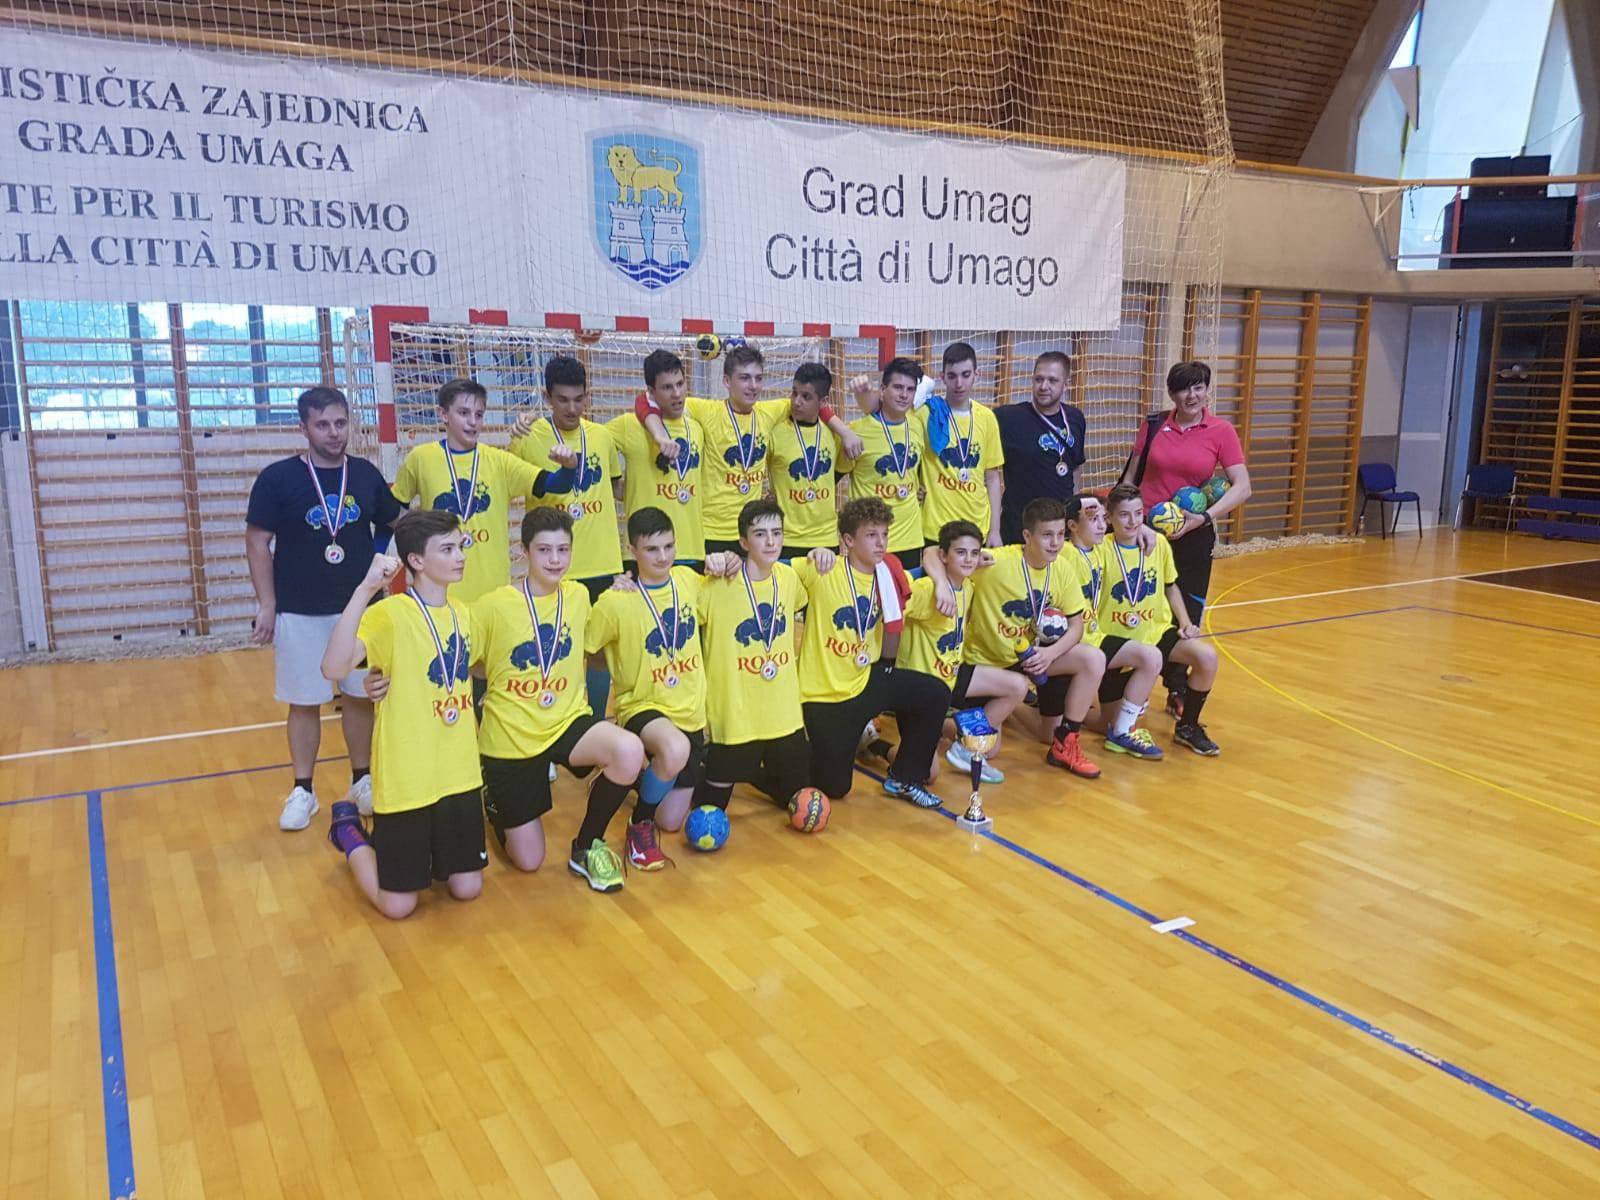 Dječaci Maksimir Pastele bez izgubljene utakmice do titule